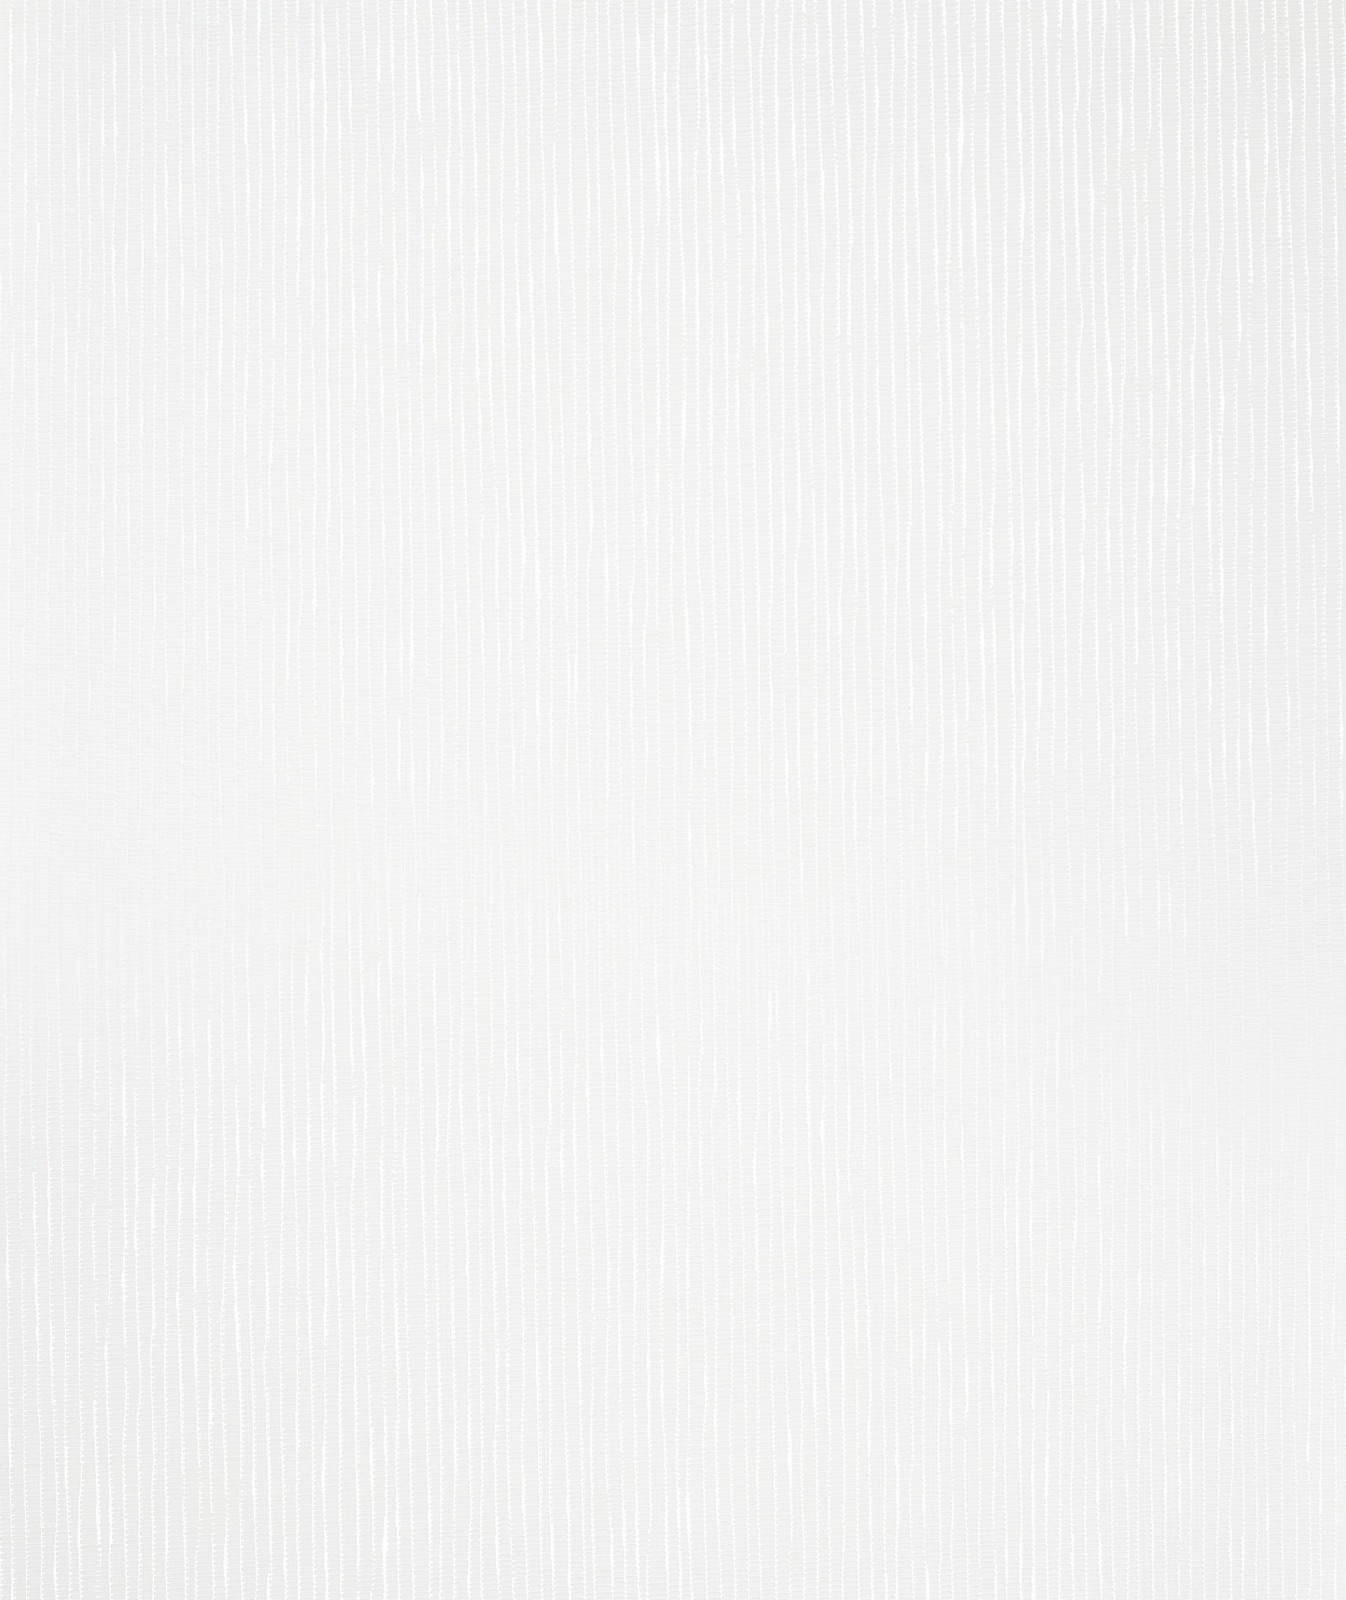 tapete tetris rasch 754001 unitapete weiss silber. Black Bedroom Furniture Sets. Home Design Ideas